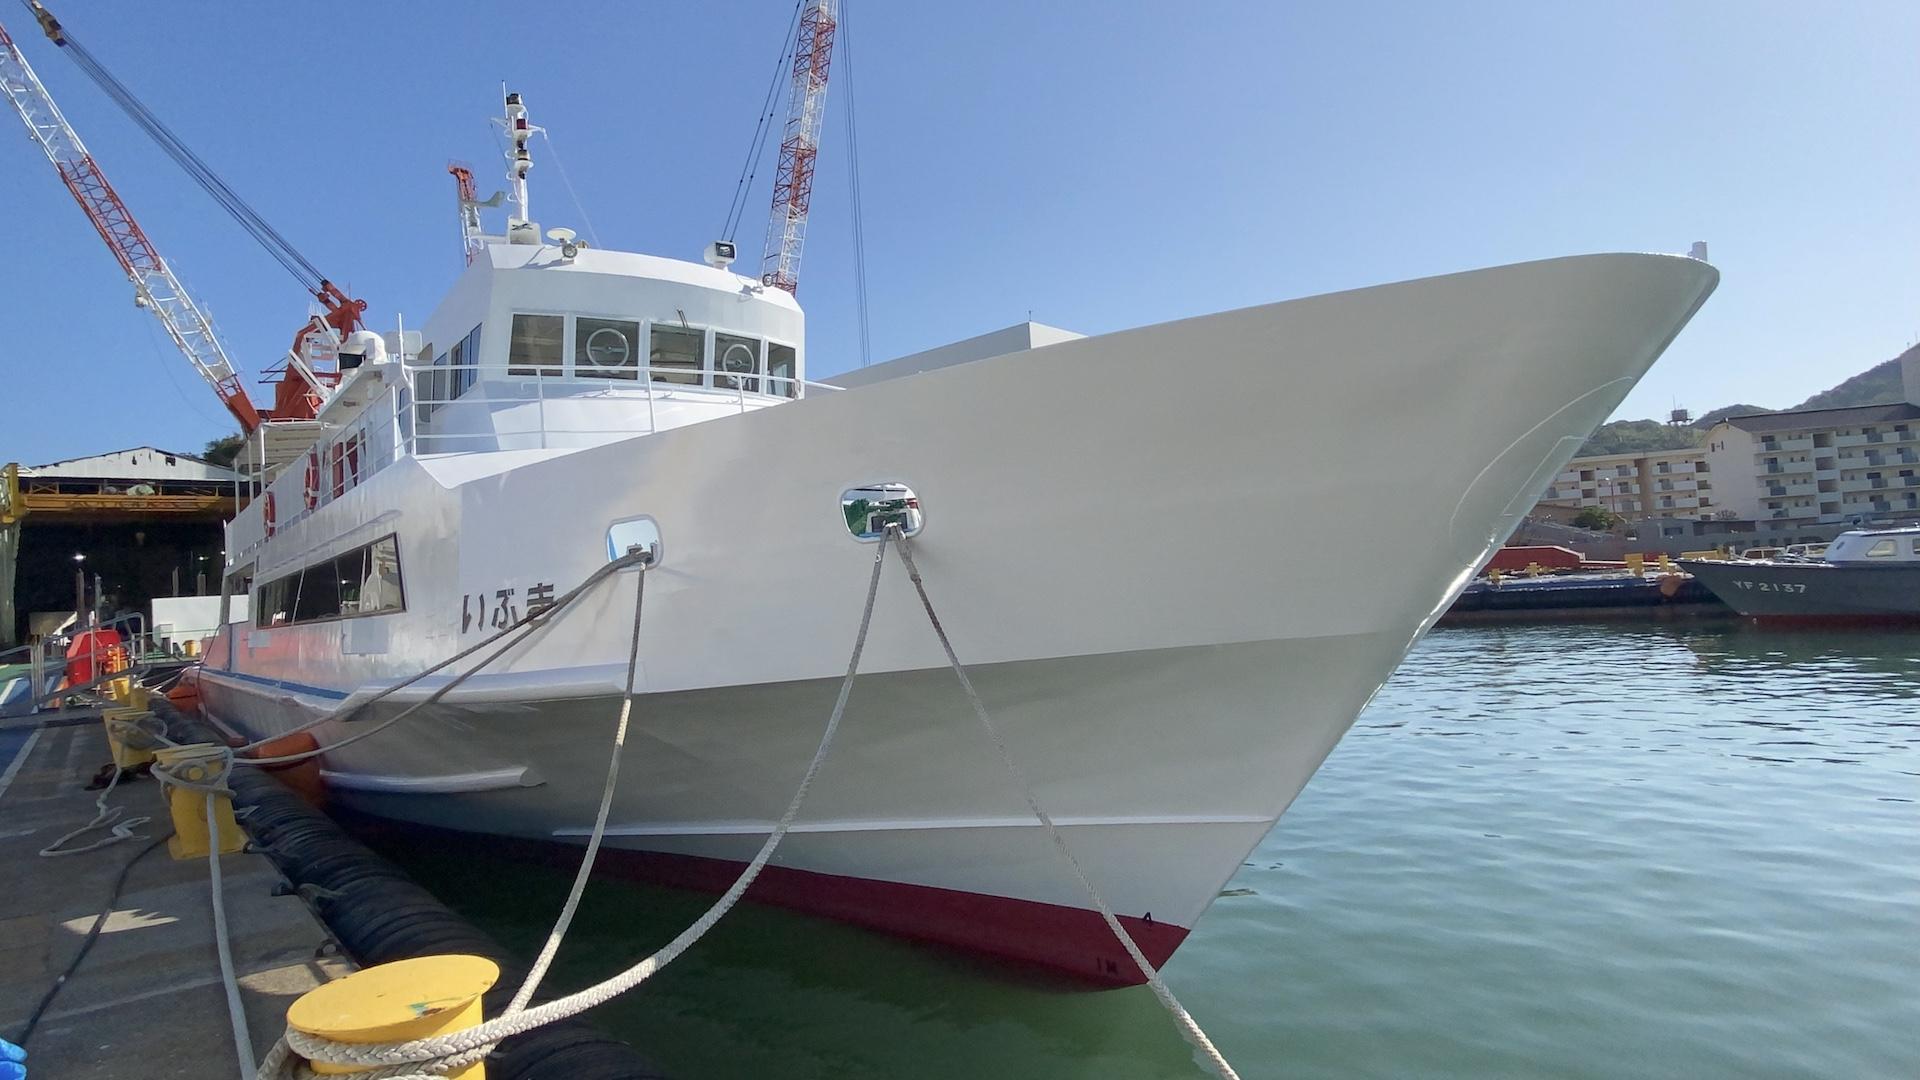 【ARROWSジャーナル #7】被災地における災害対応医療船の役割